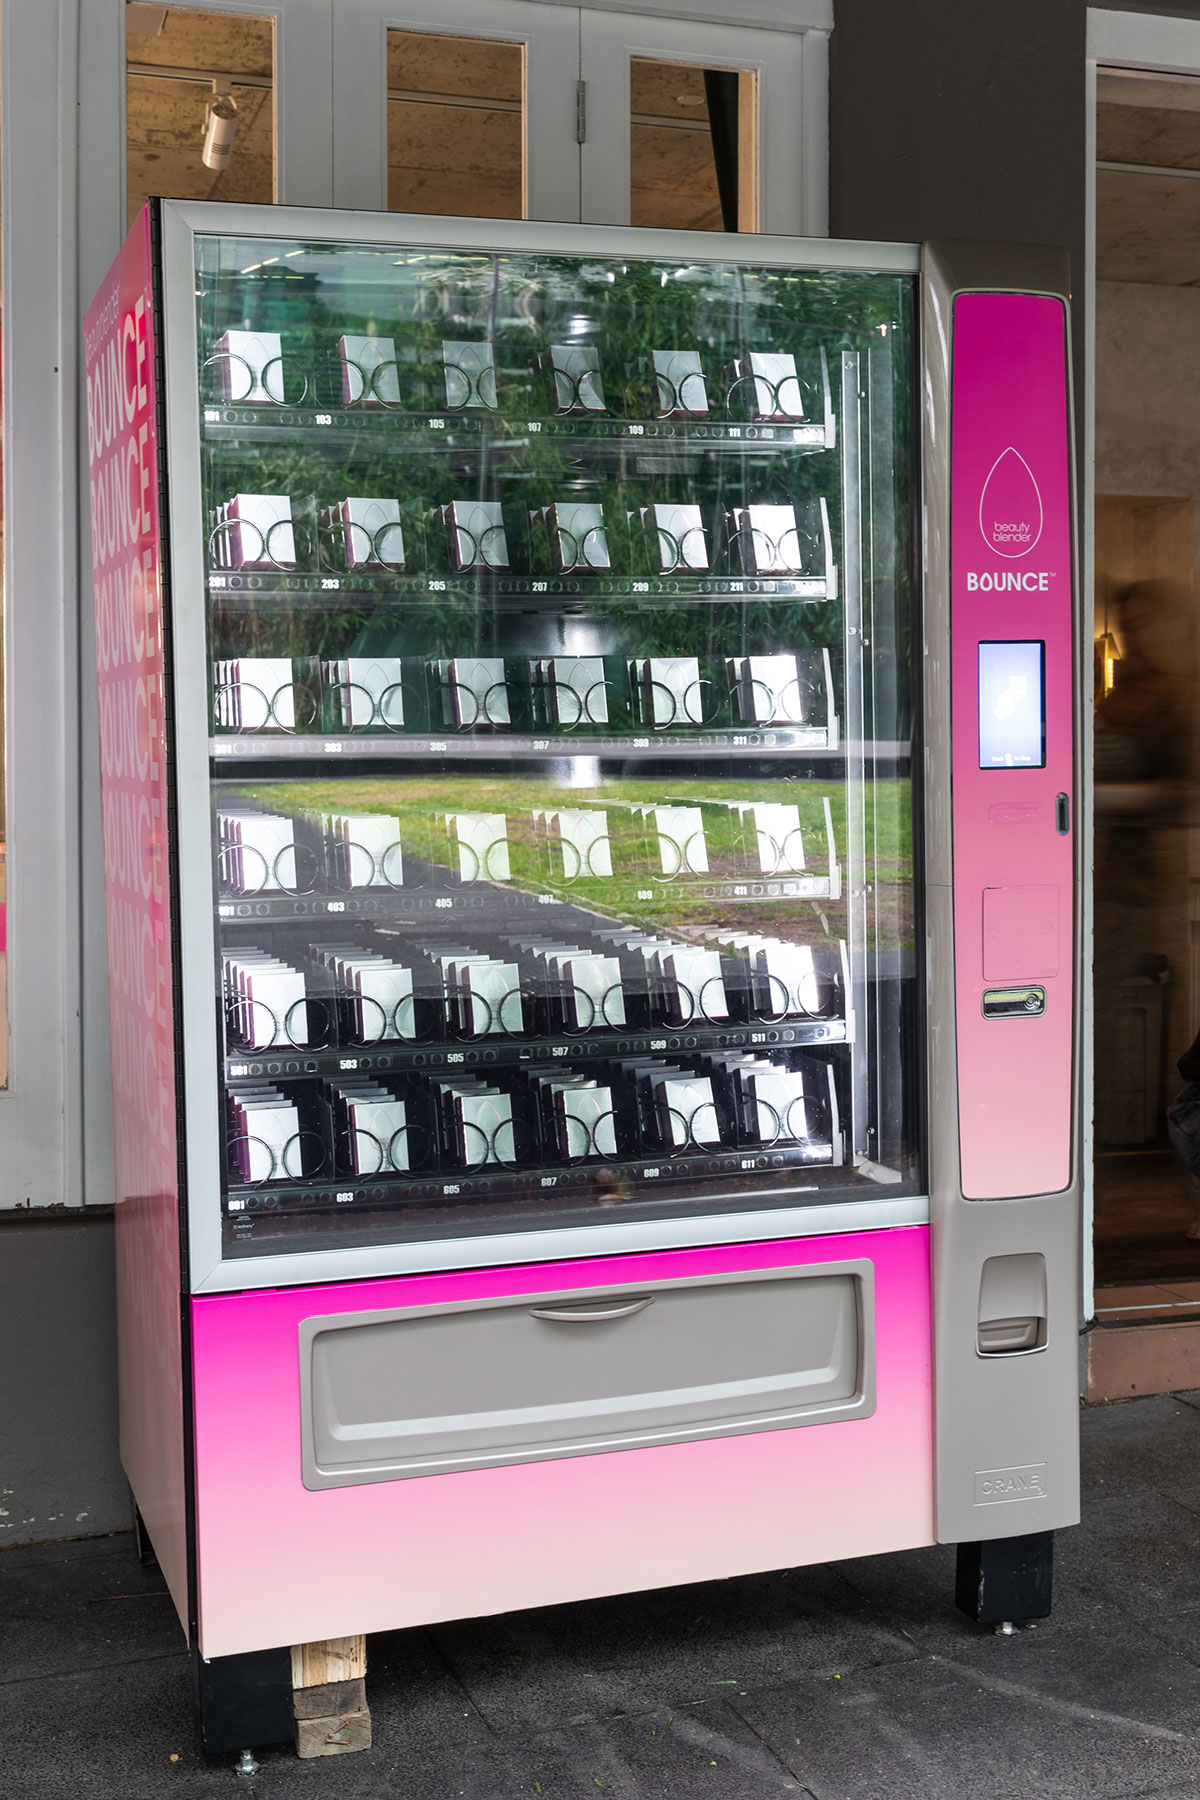 Prince Auto Sales >> Make-up and beauty custom vending machine - Autovending